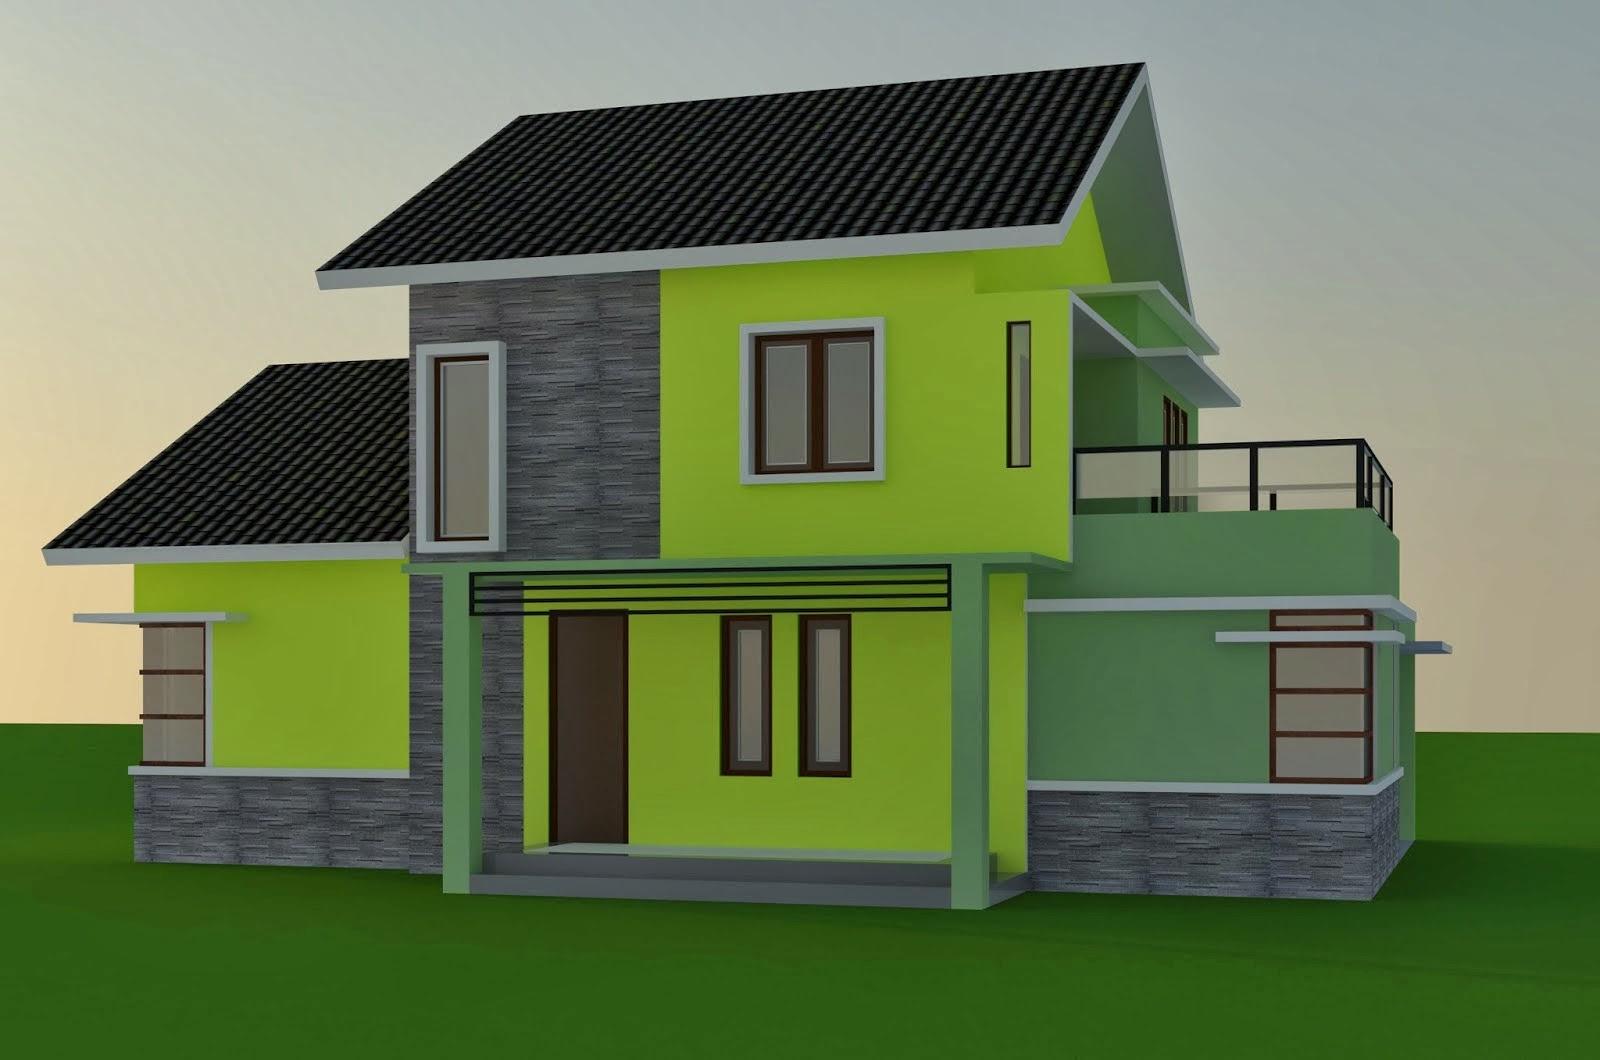 10 Kombinasi Warna Cat Rumah Hijau Untuk Rumah Minimalis ...